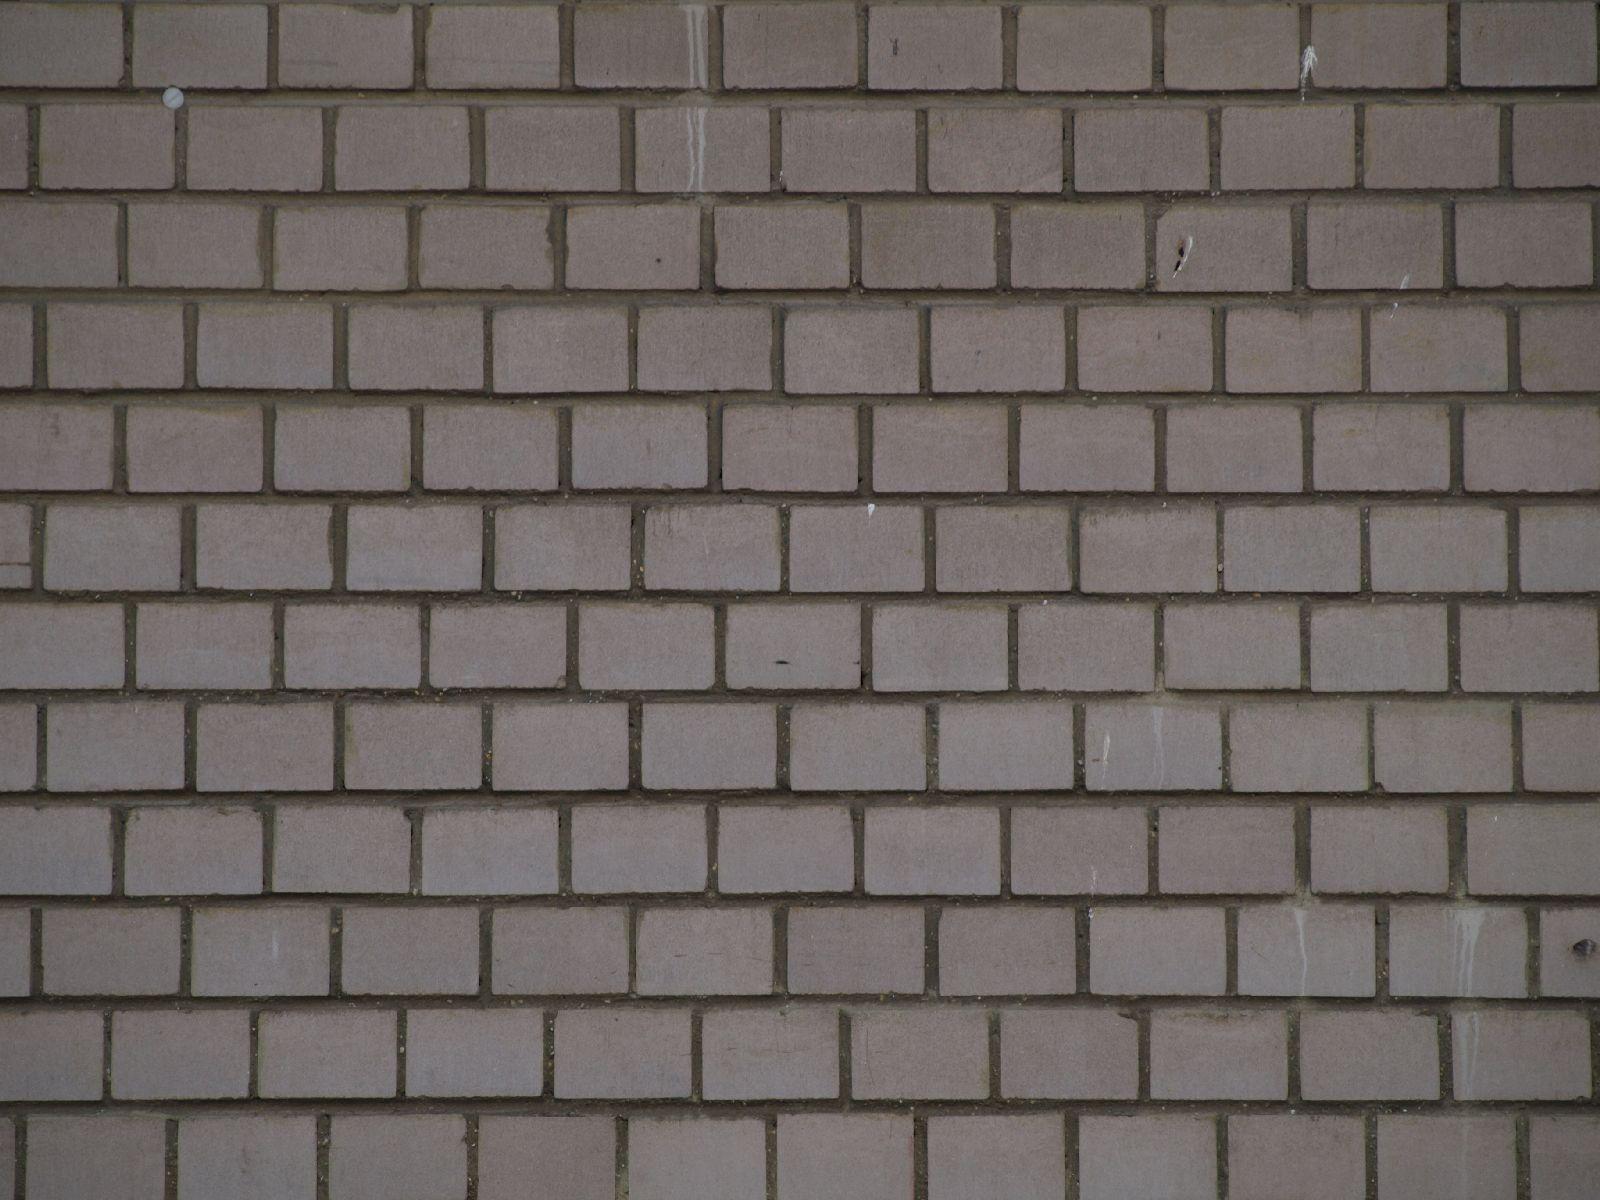 Brick_Texture_A_PC137649